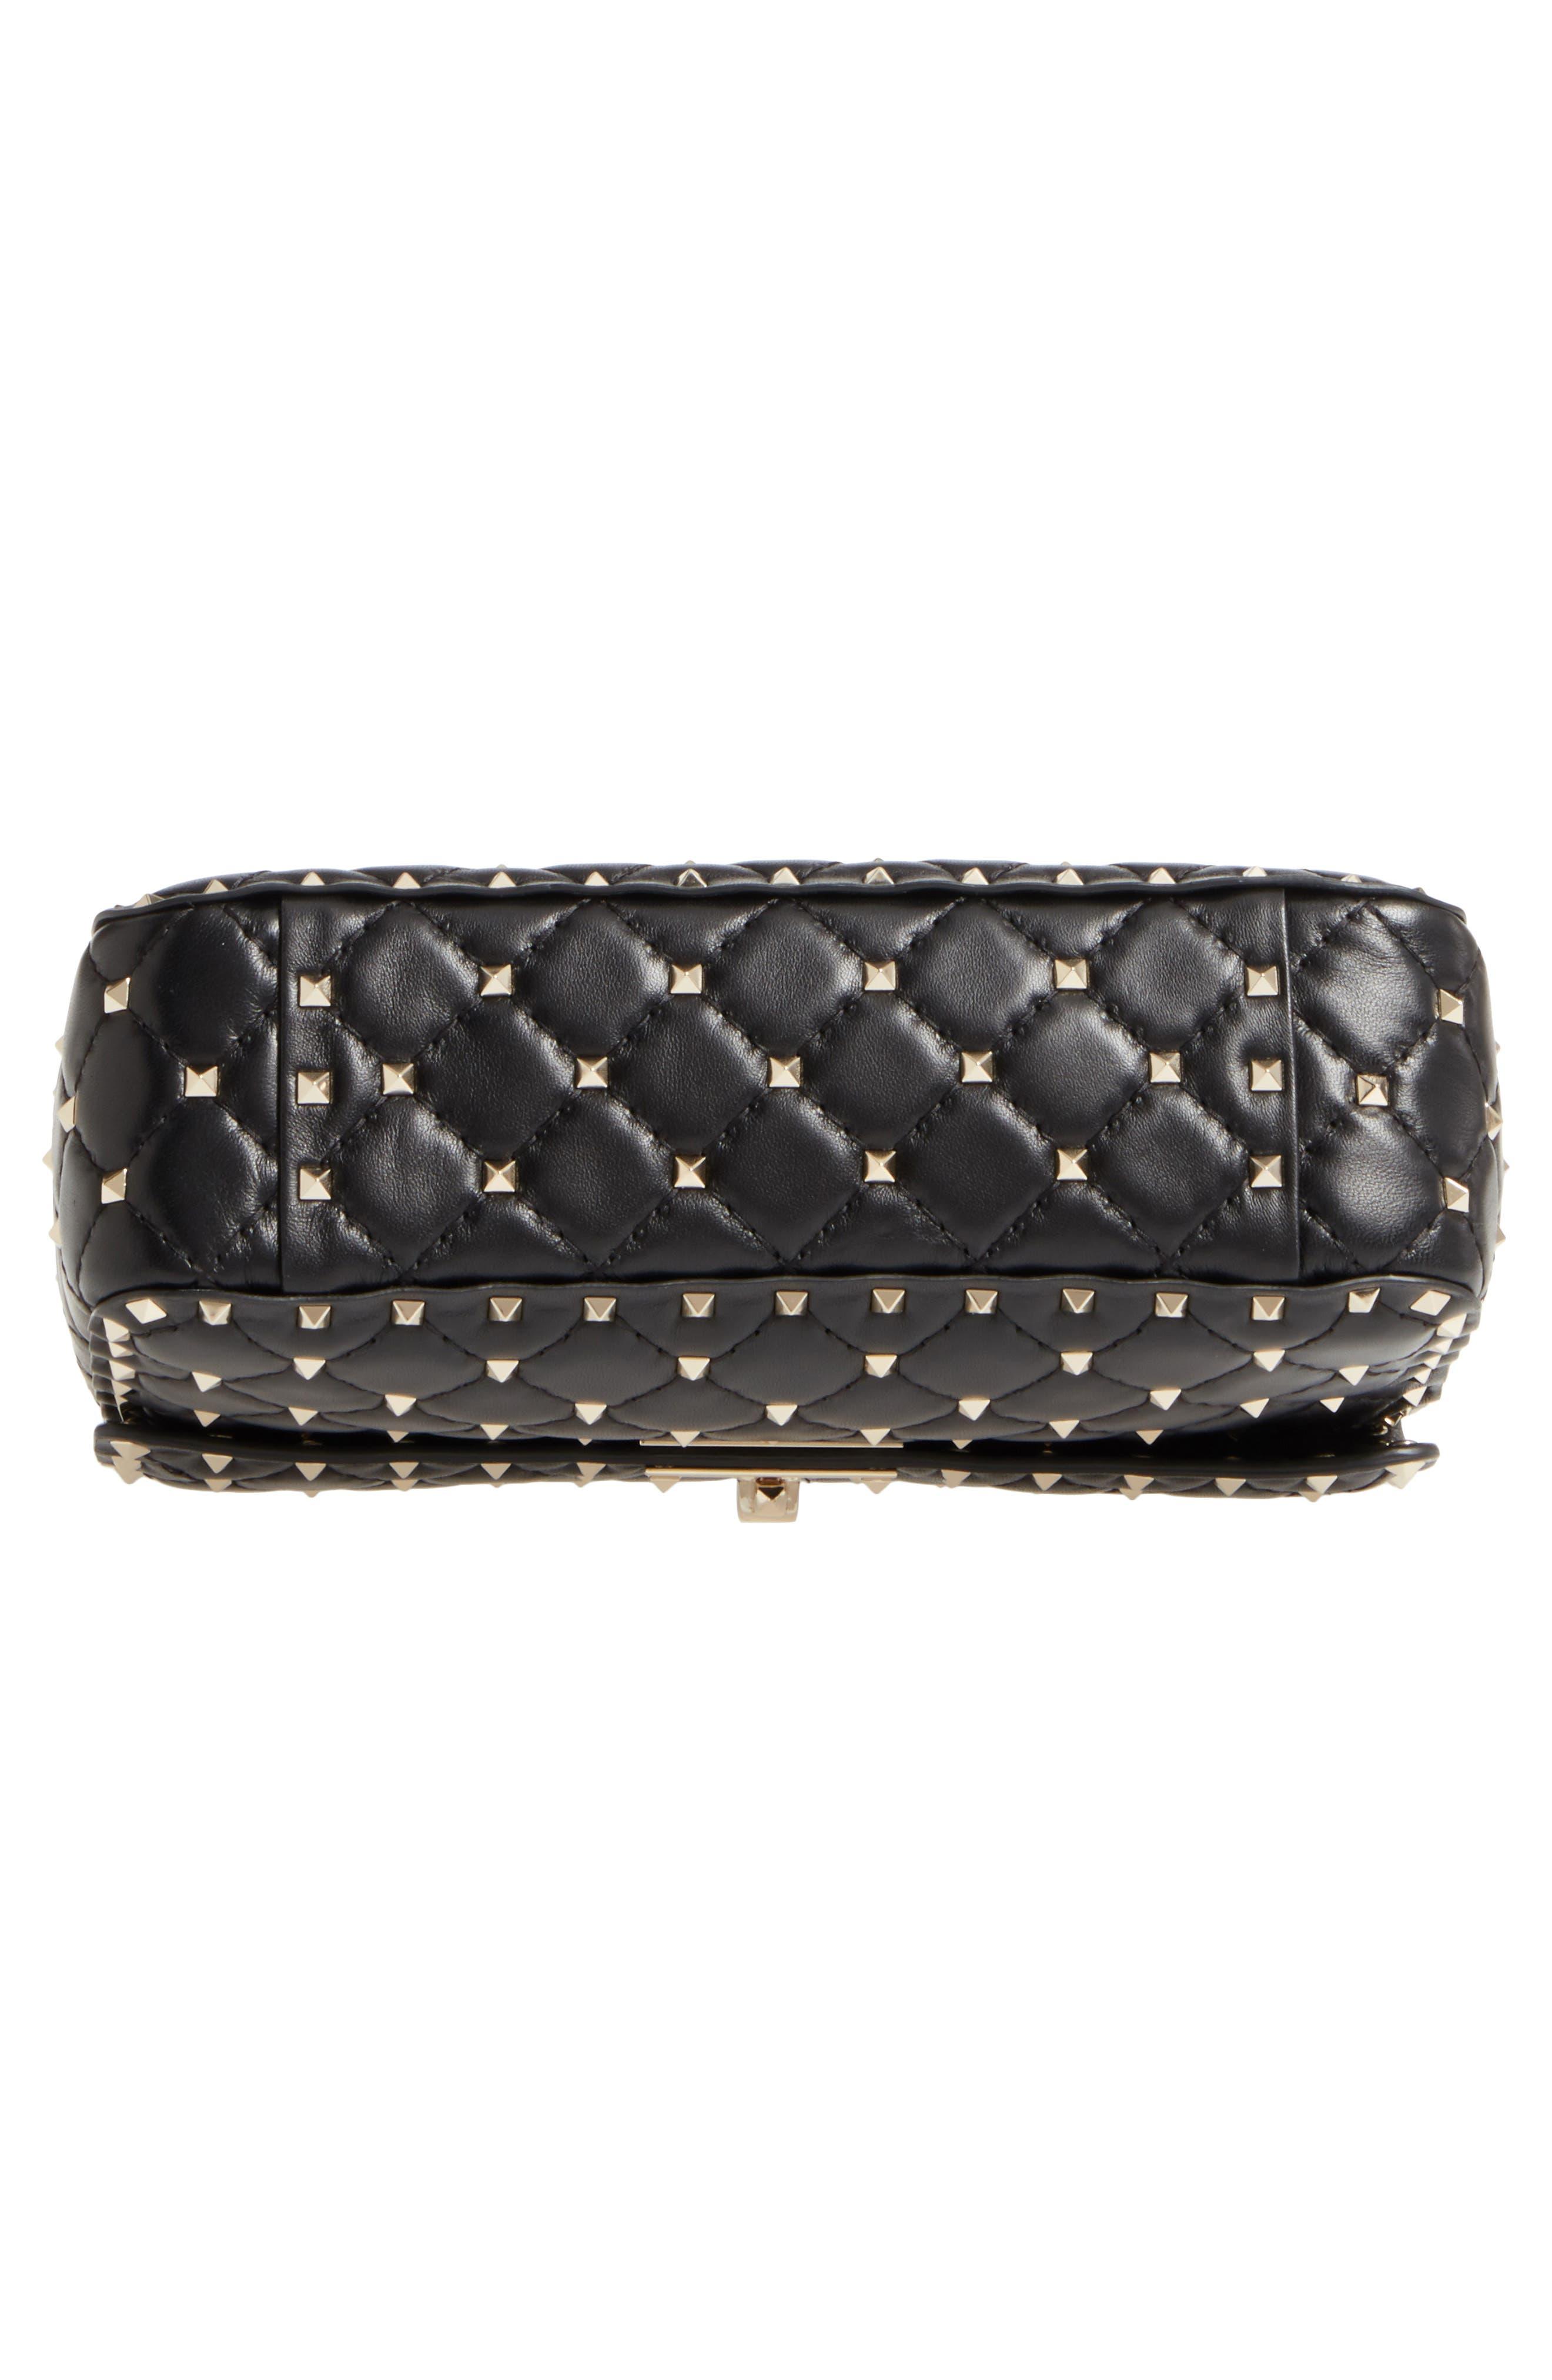 Medium Rockstud Matelassé Quilted Leather Shoulder Bag,                             Alternate thumbnail 6, color,                             BLACK